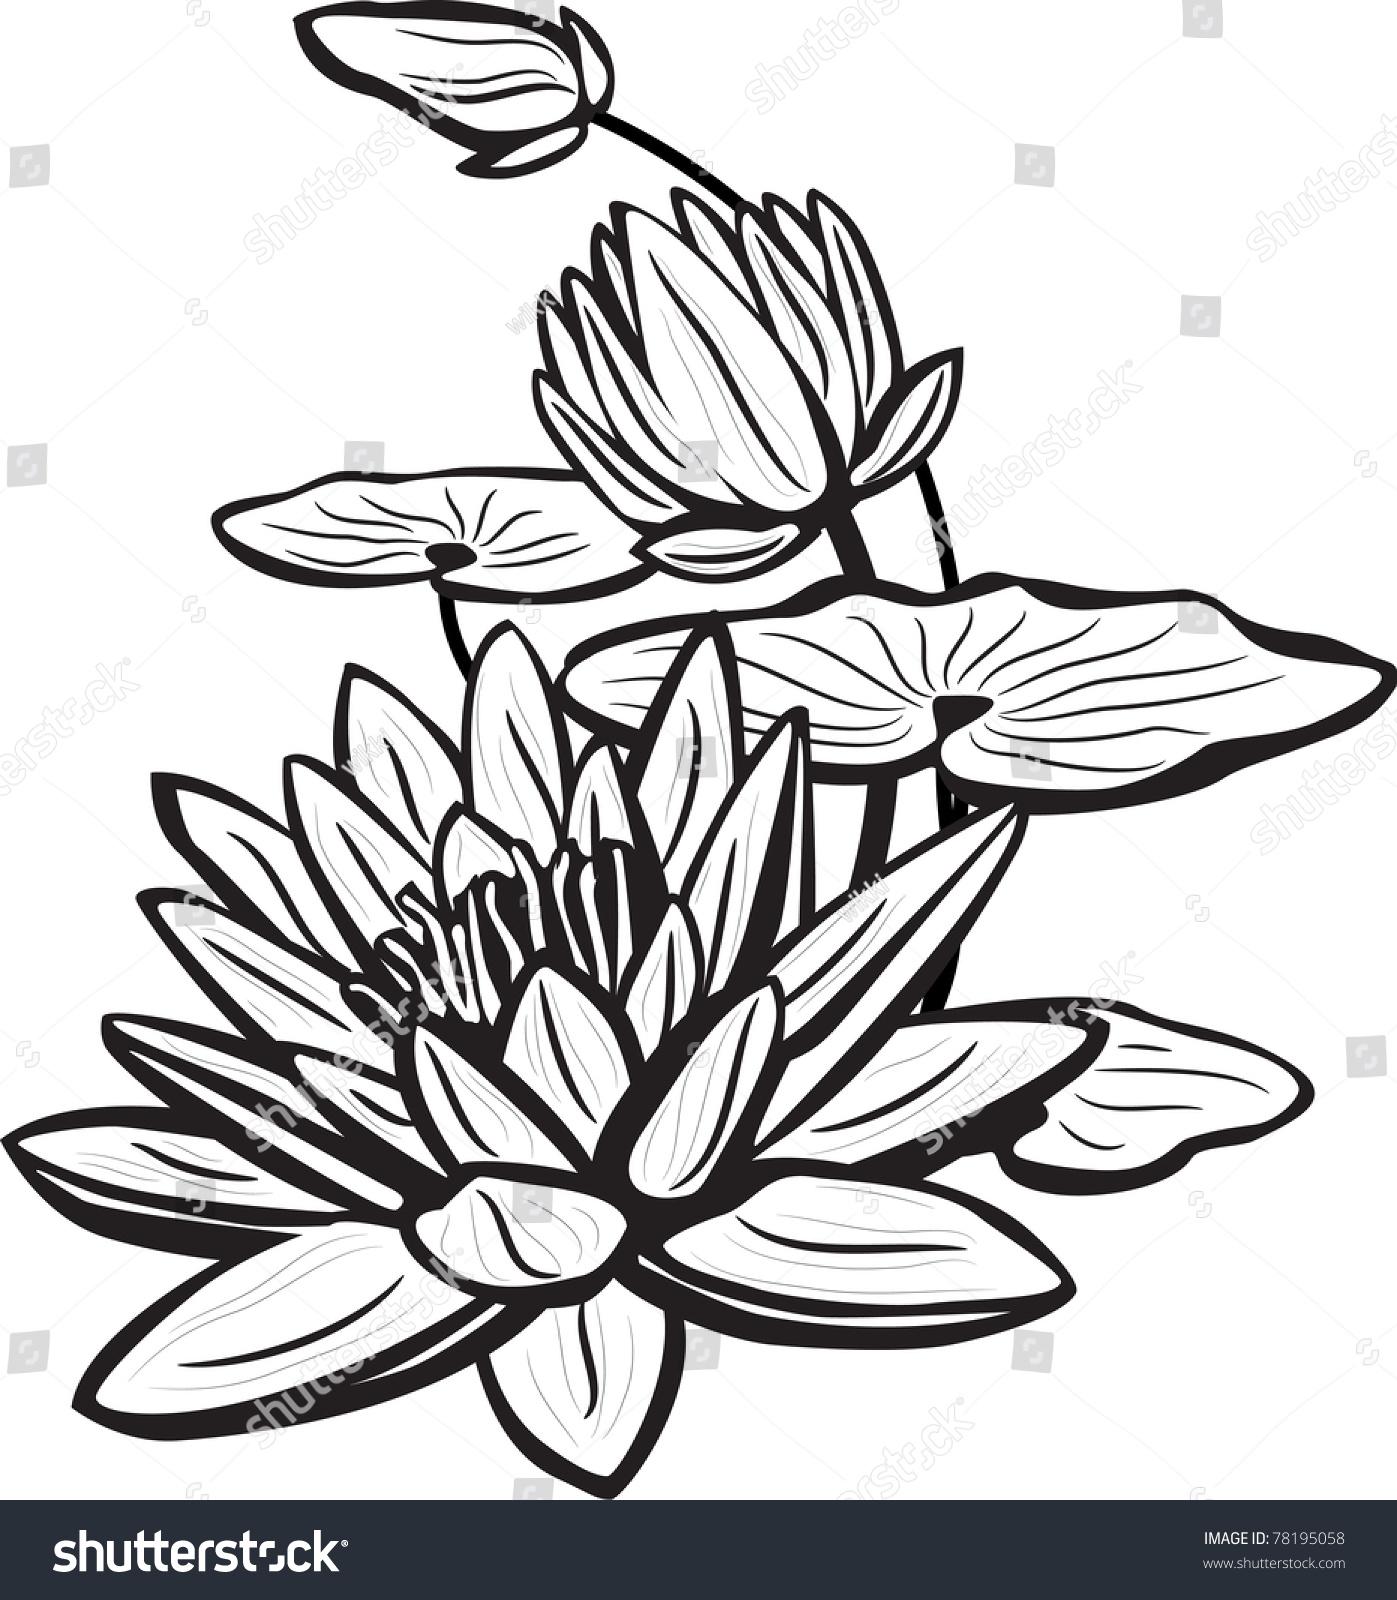 Sketch lotus flowers stock vector royalty free 78195058 shutterstock sketch of lotus flowers izmirmasajfo